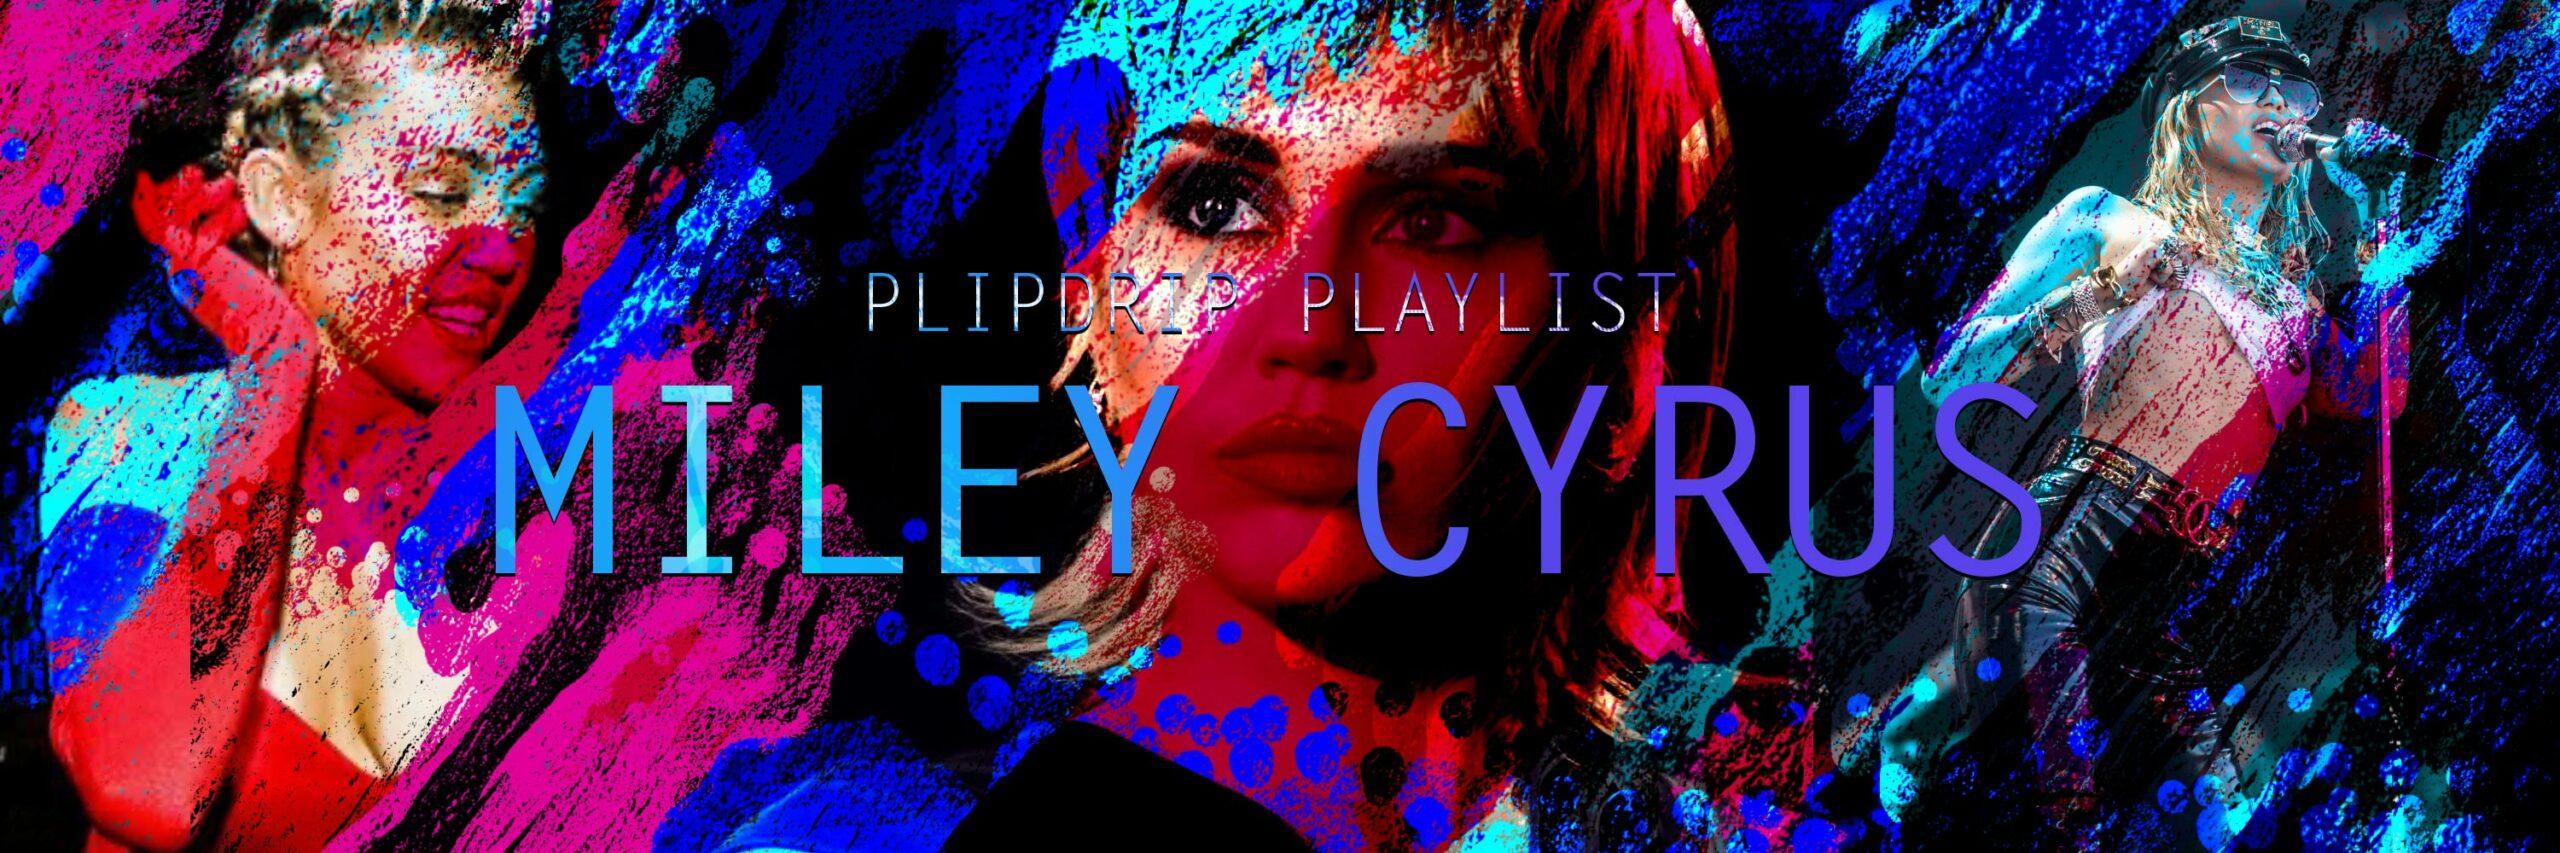 PF-miley-cyrus-banner-1